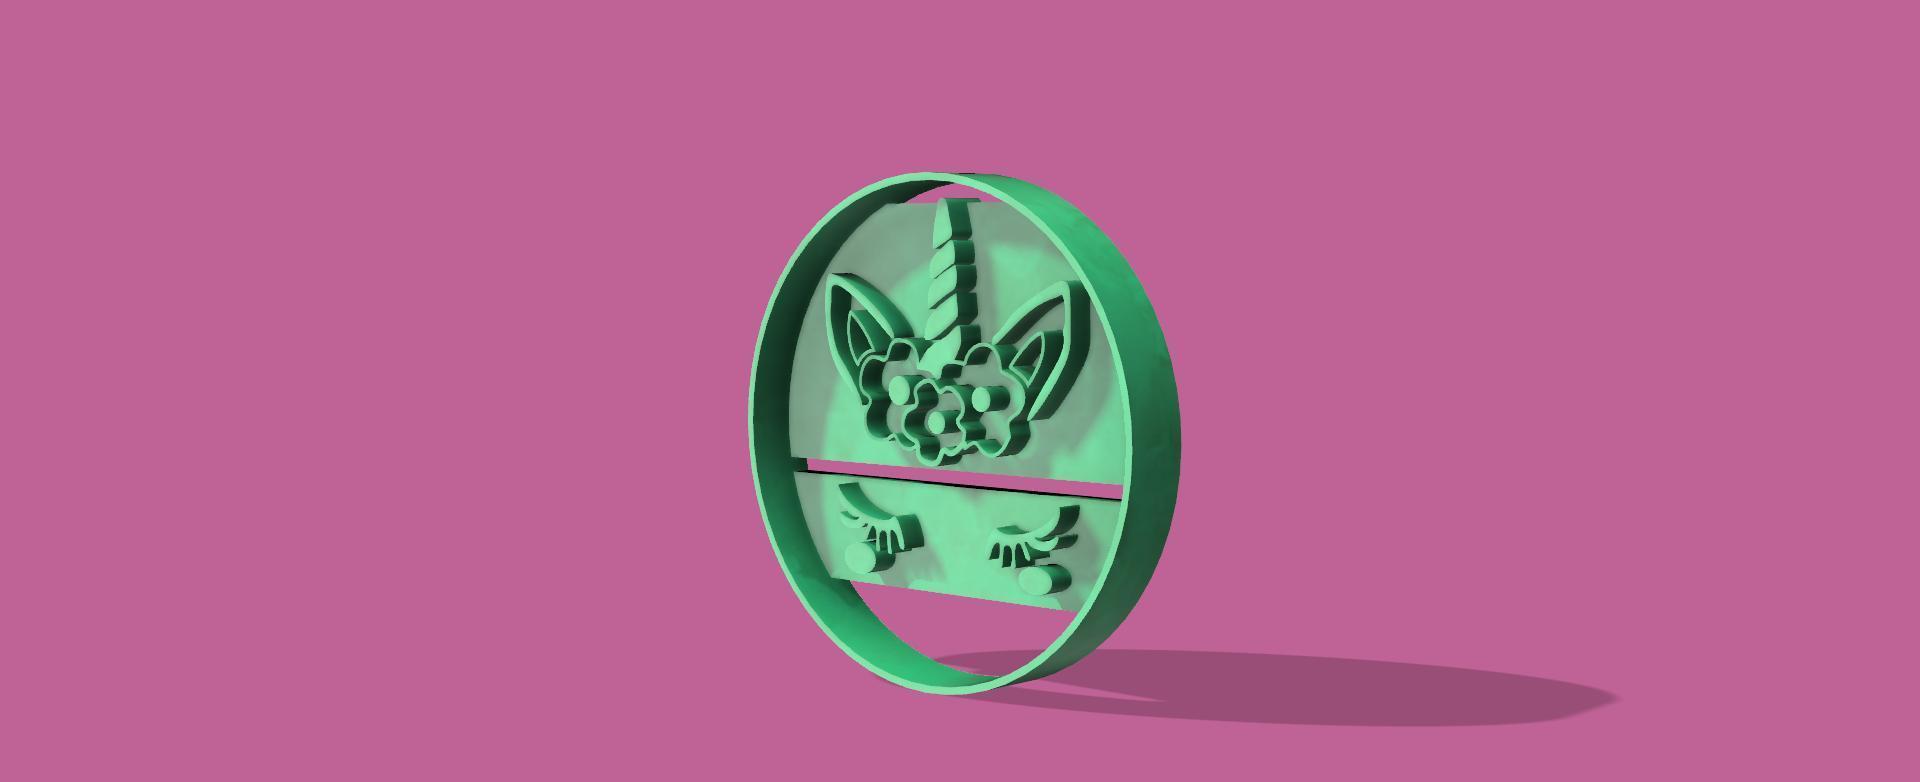 unicornio ojitos v1.jpg Download STL file Unicorn and flower cookie cutter • 3D printer model, Geralp